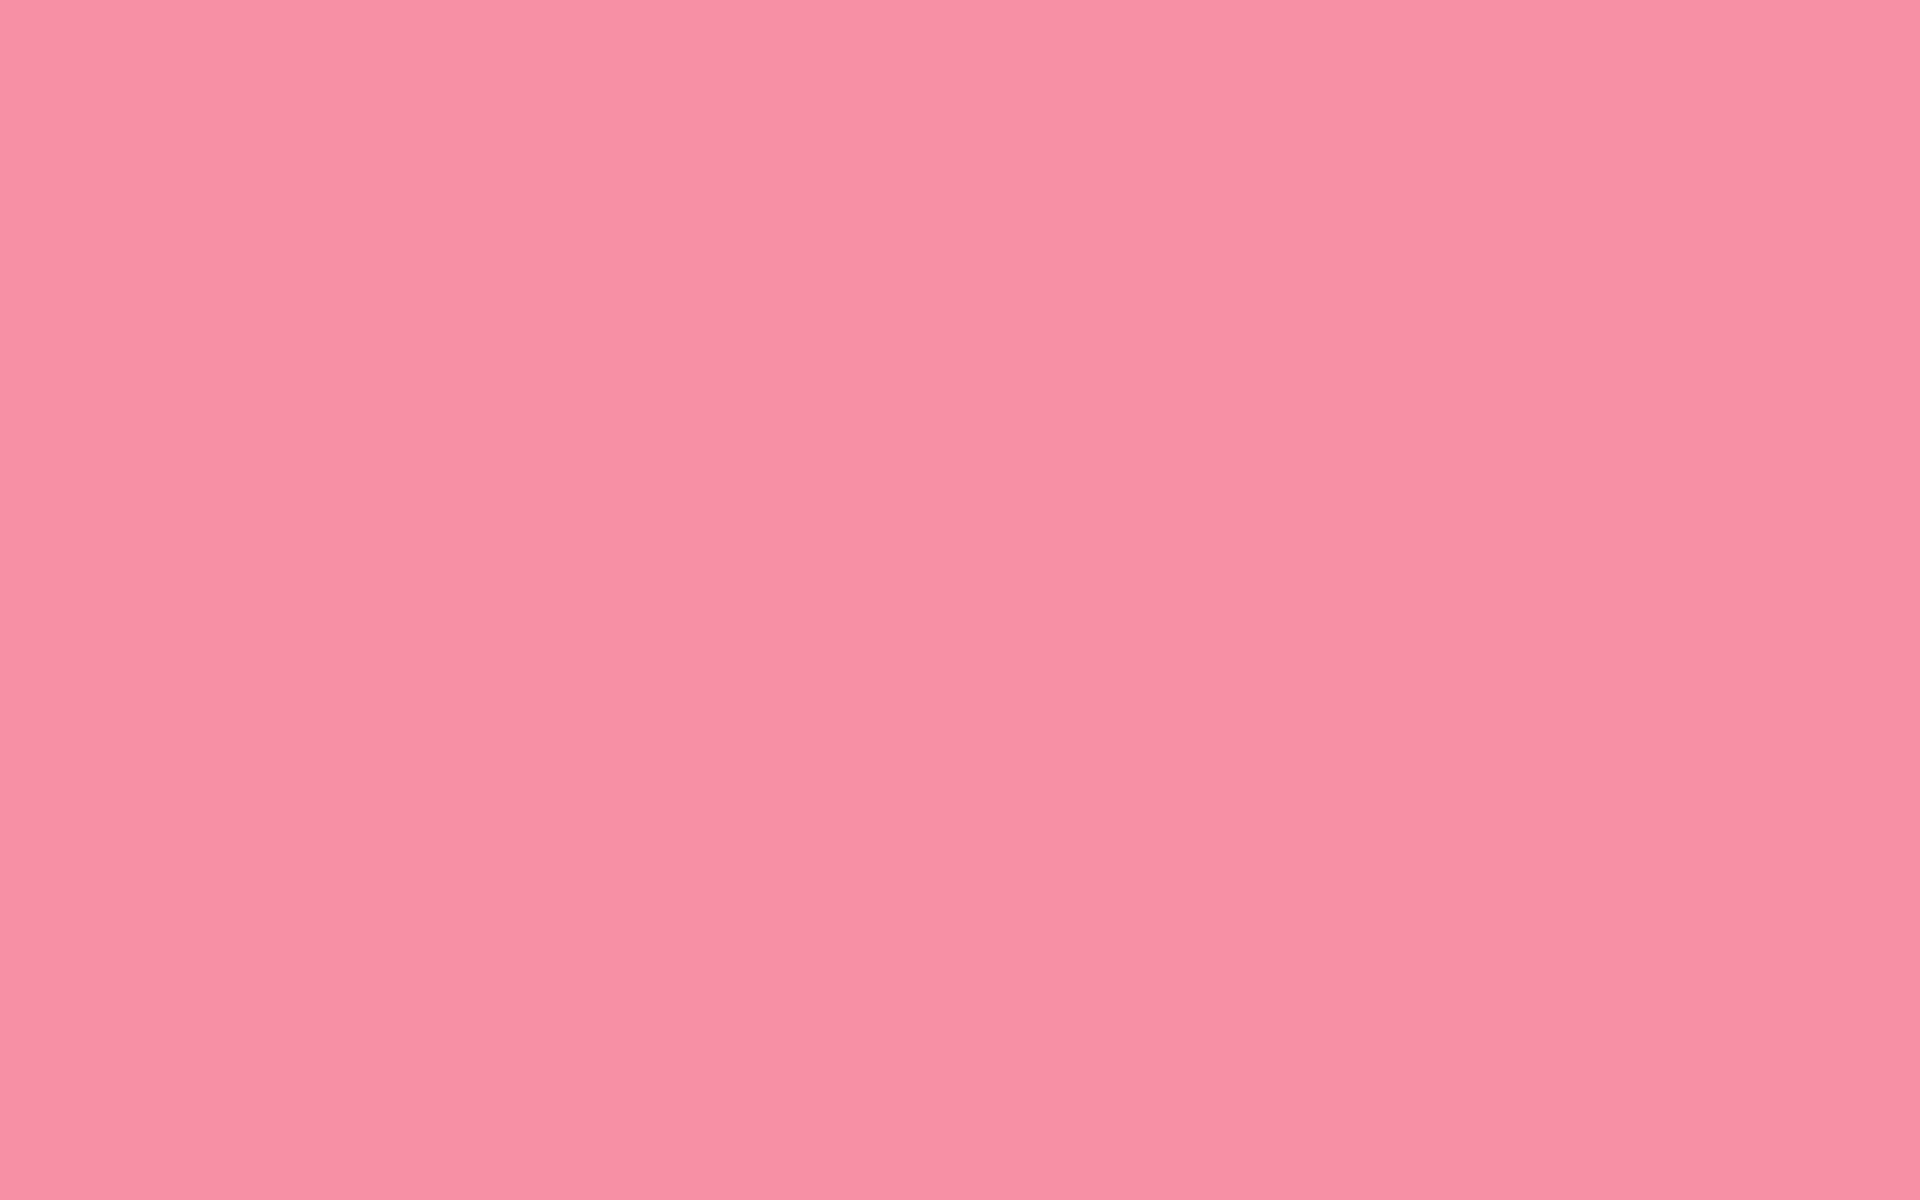 1920x1200 Pink Sherbet Solid Color Background